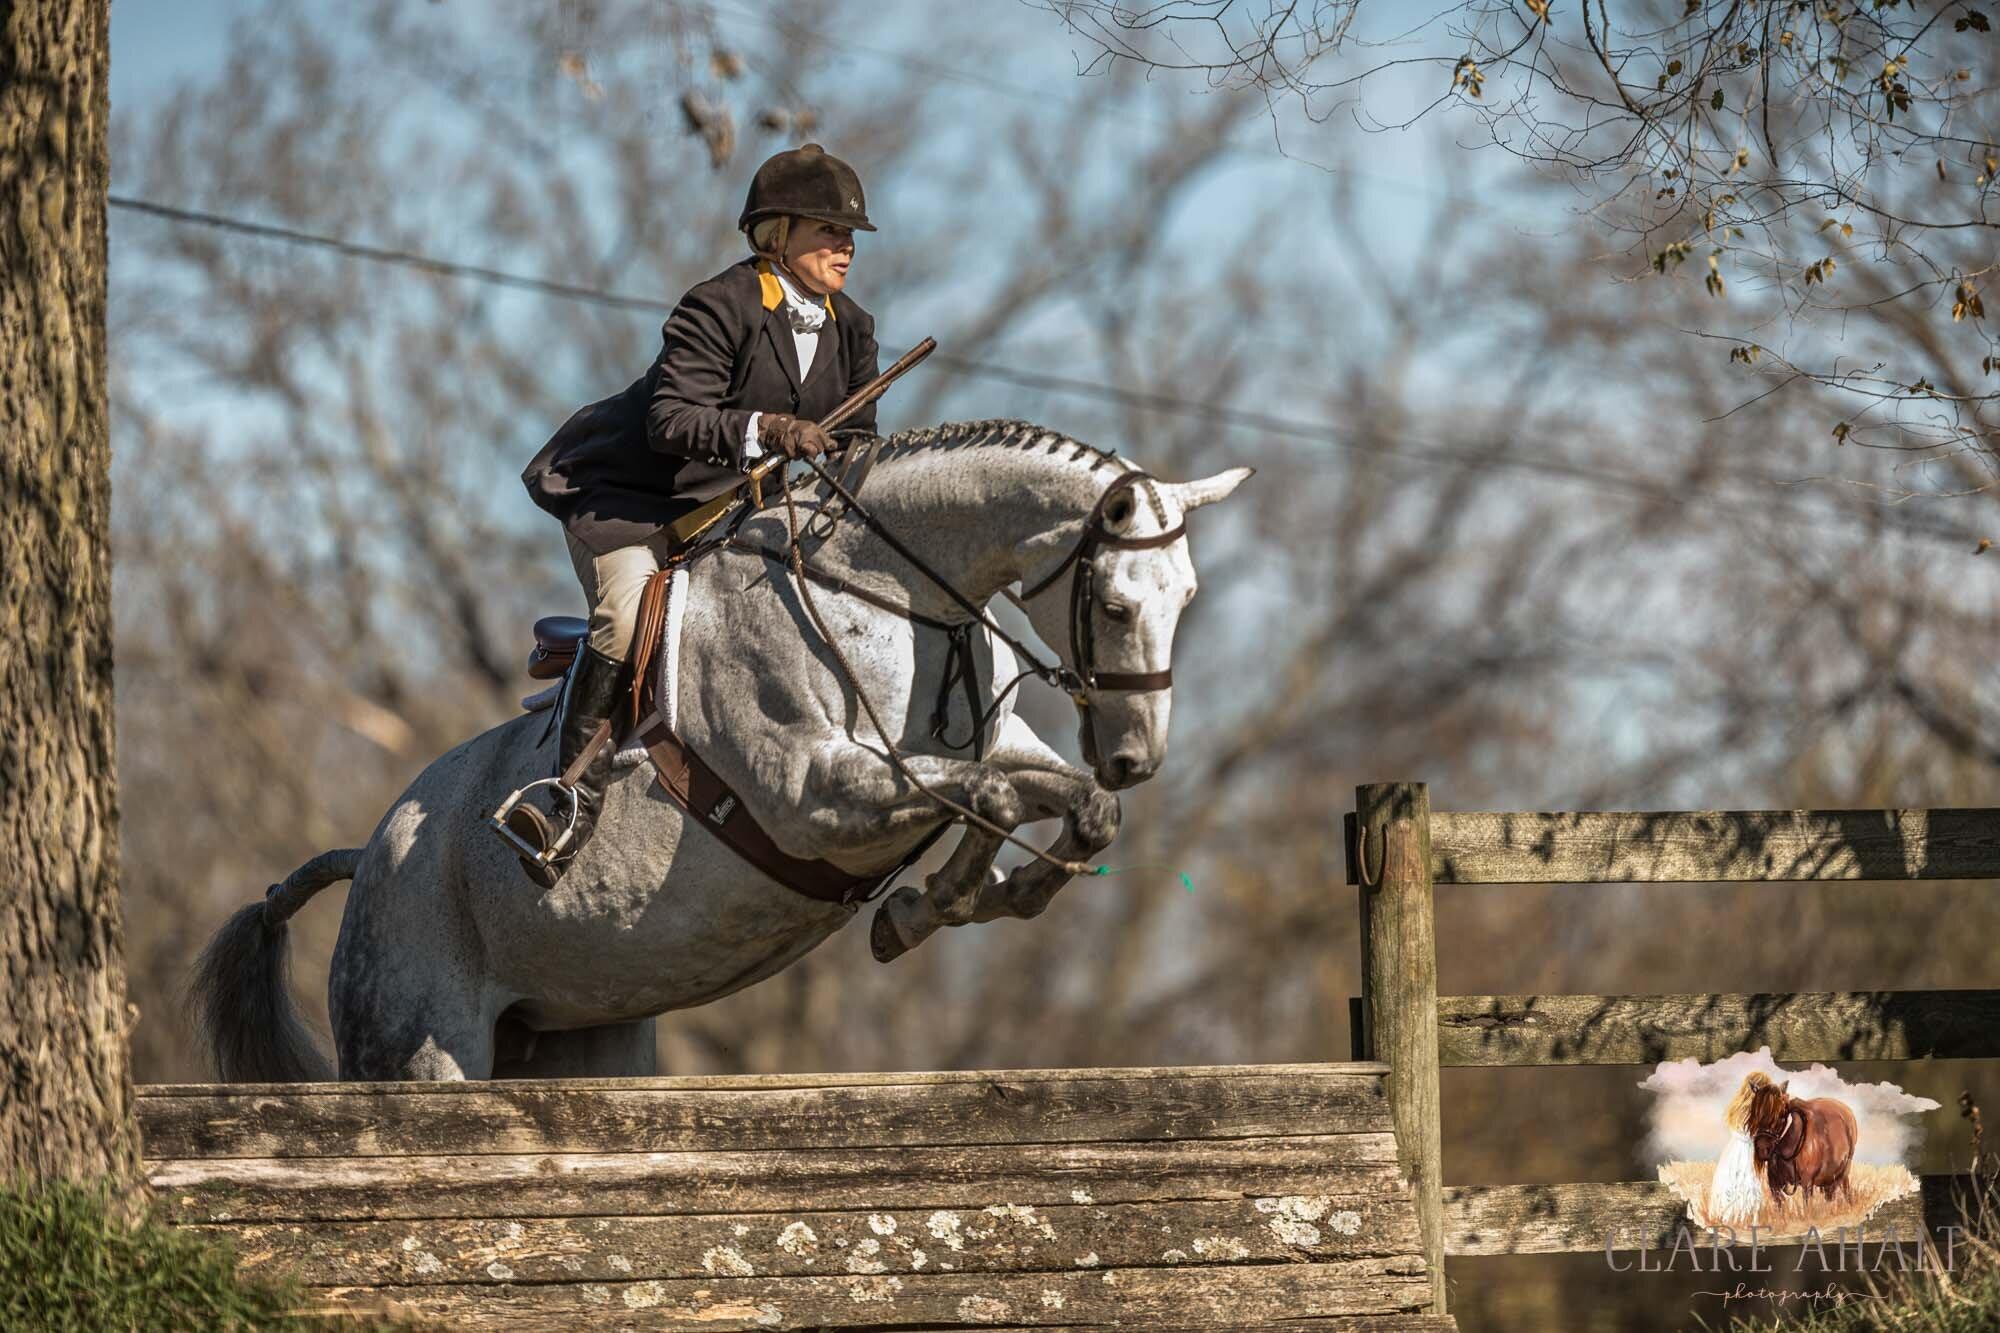 equine_photographer_potomac_md_equine_photographer_middleburg_VA_equine_portraiture_loudon_county_VA-1110.jpg